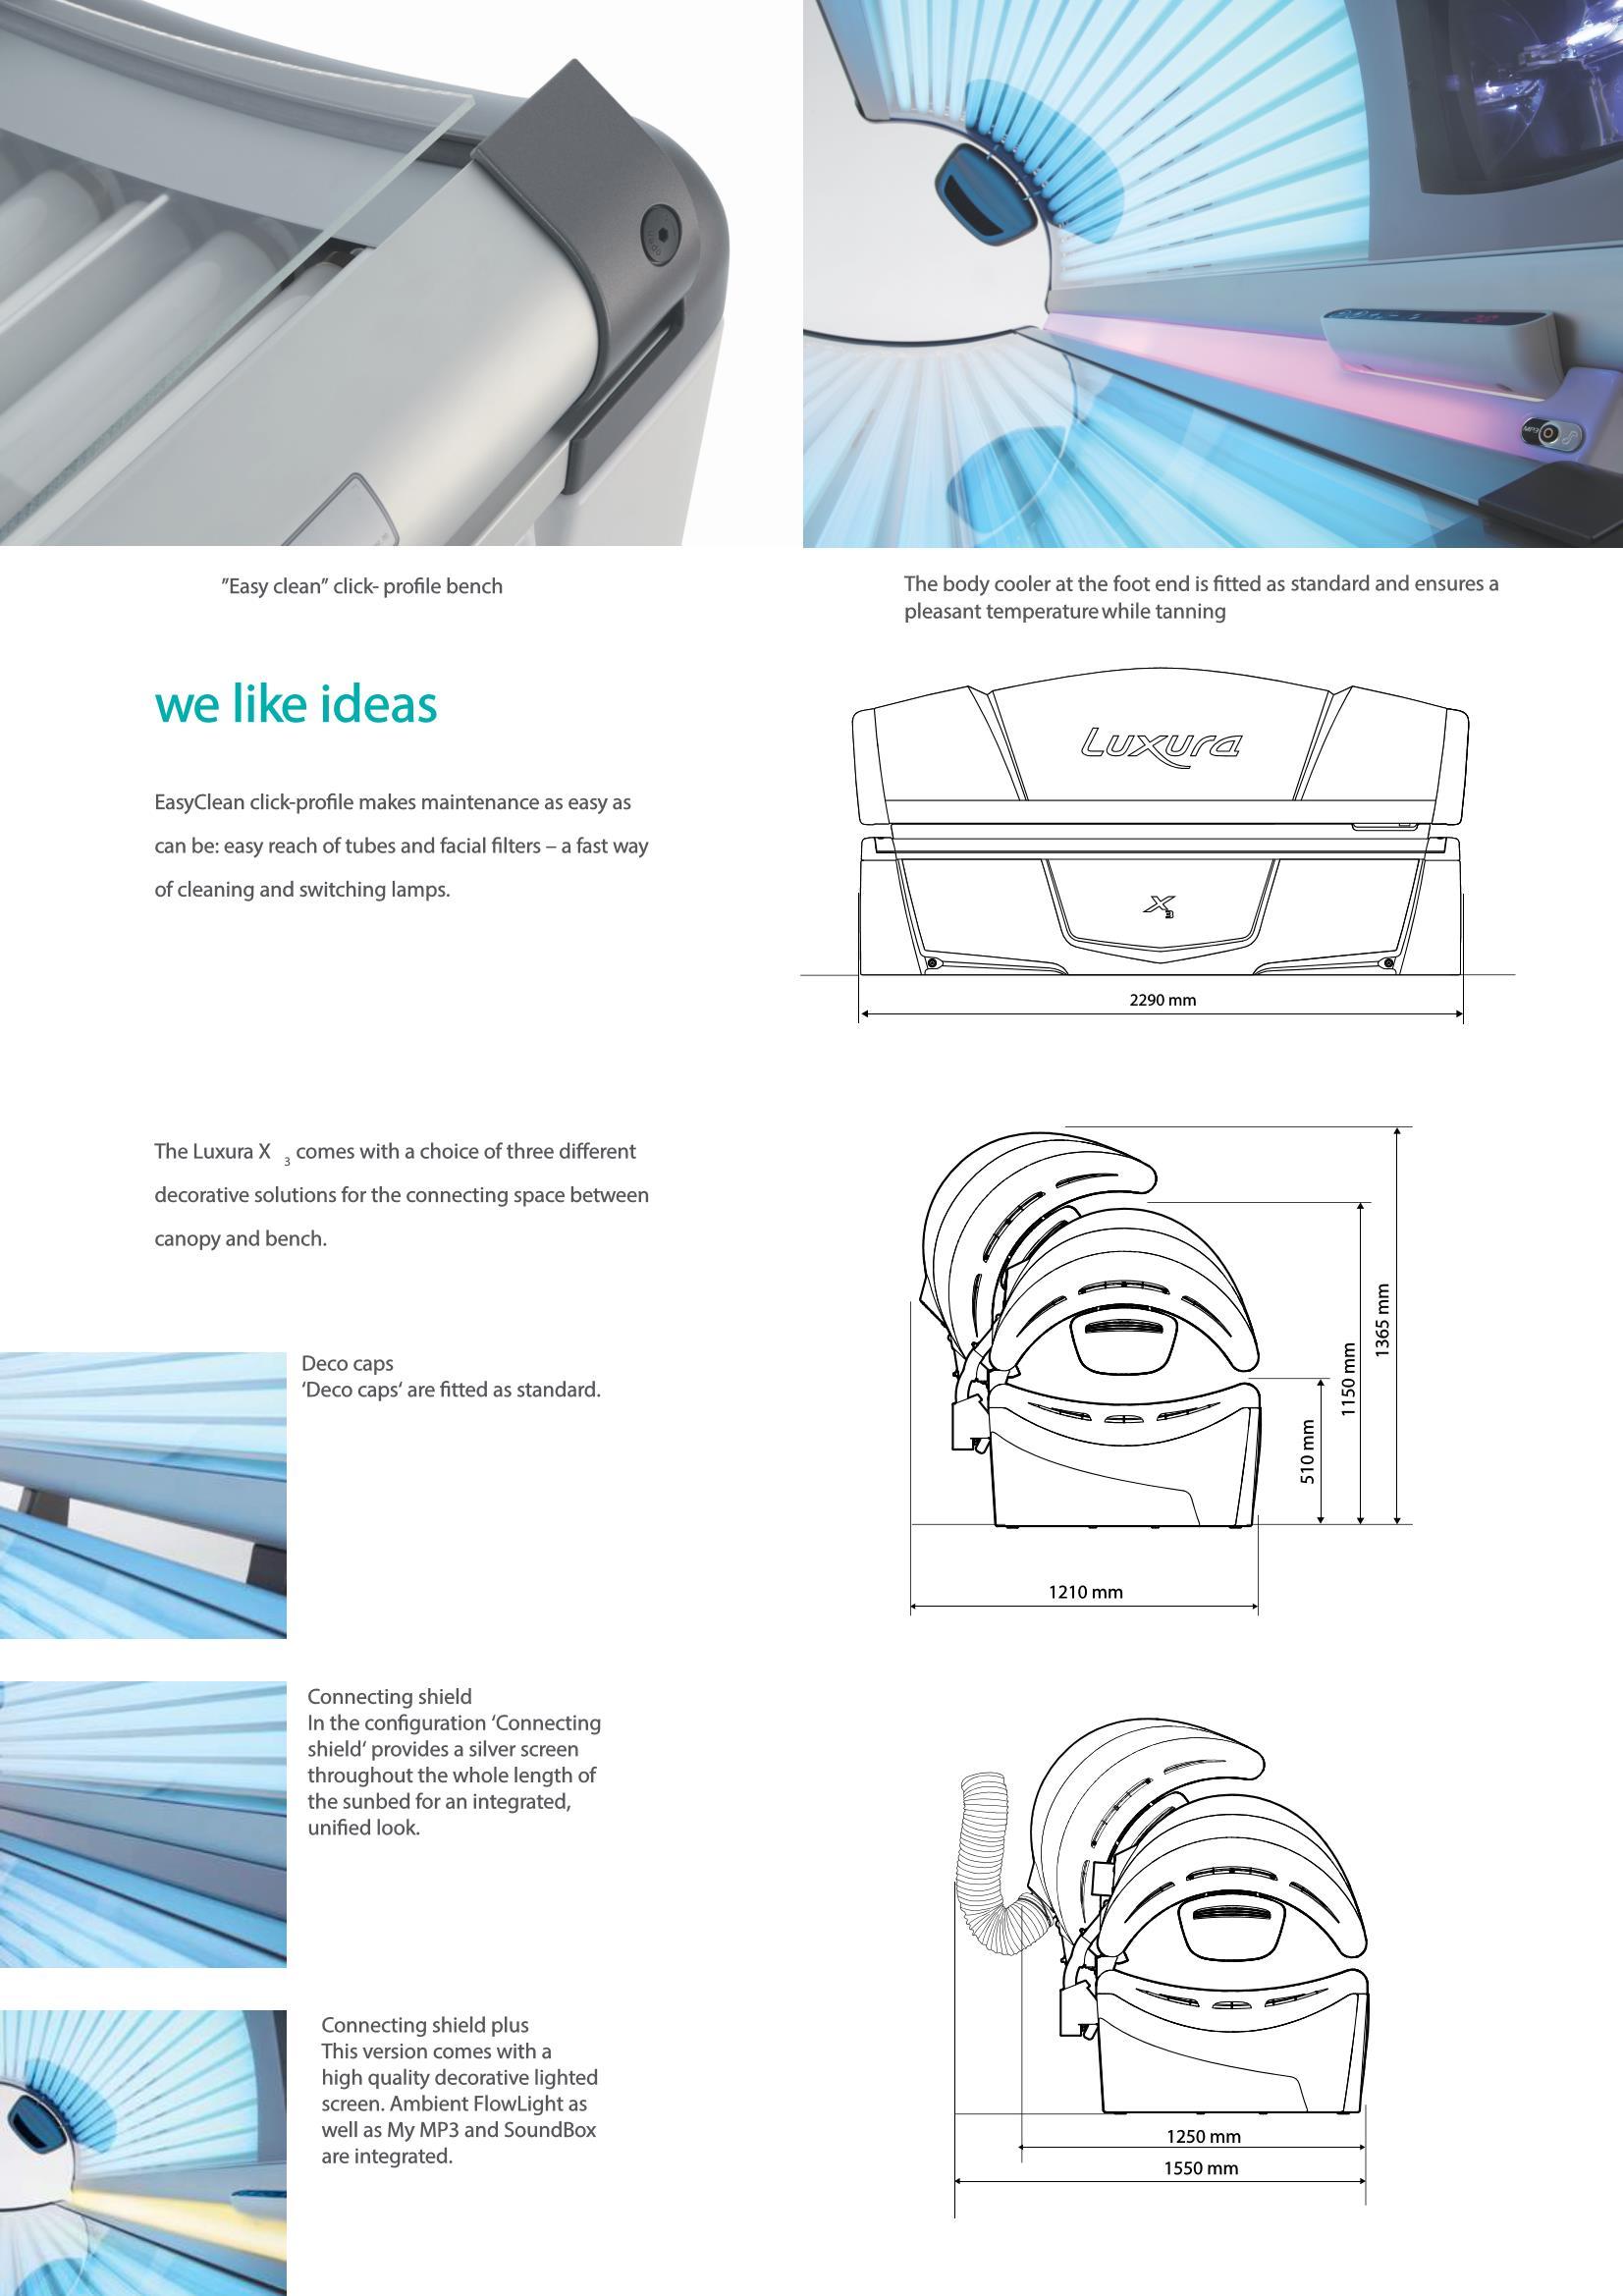 luxura-brochure-page-6.jpeg